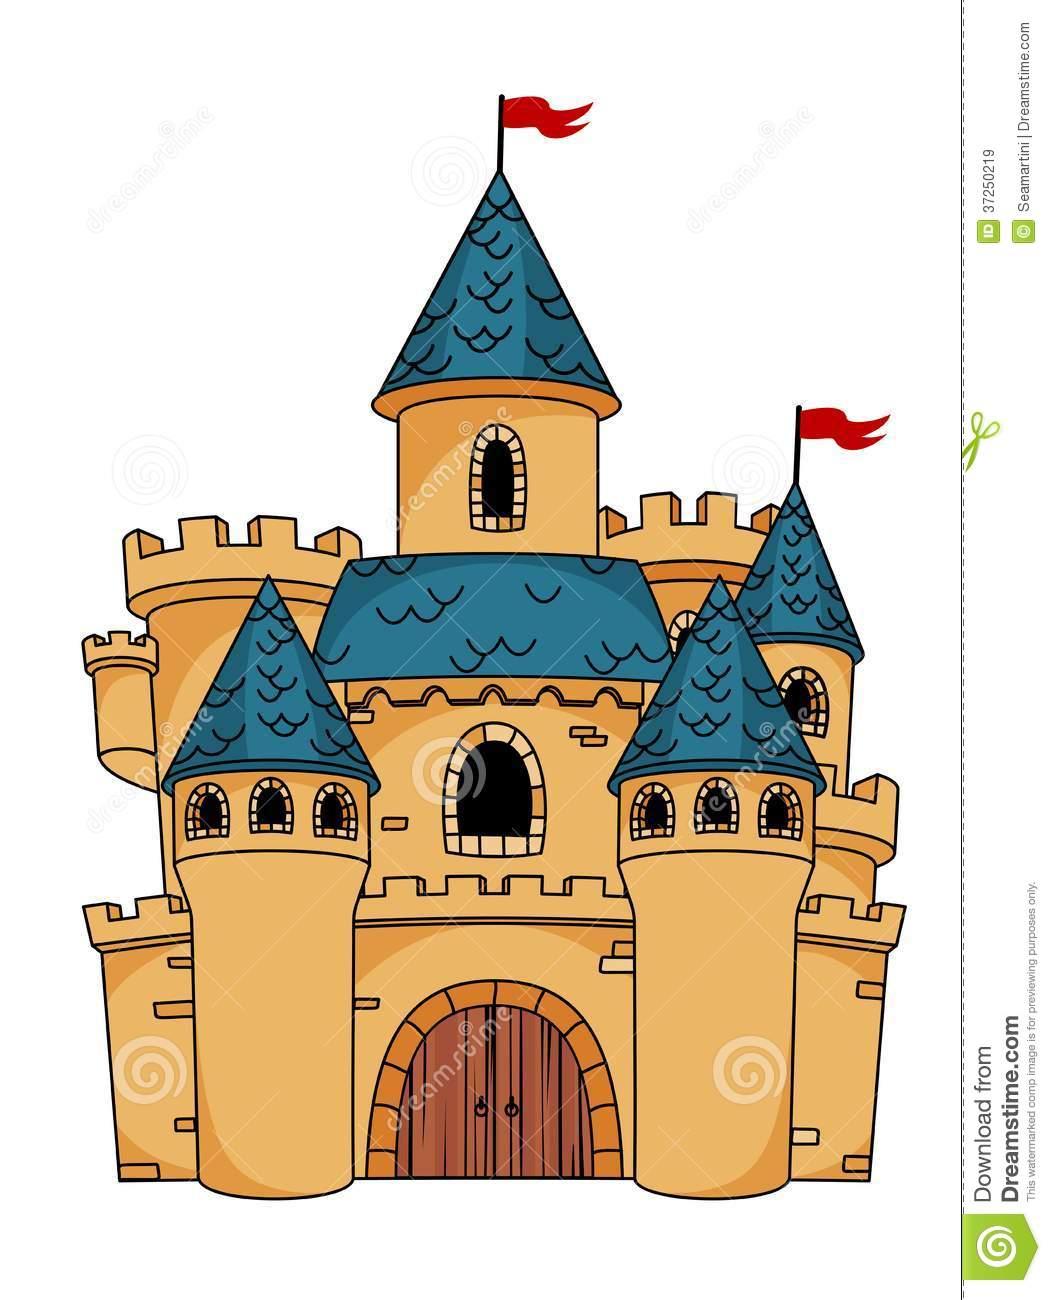 Imagens De Stock Royalty Free  Medieval Cartoon Castle  Imagem